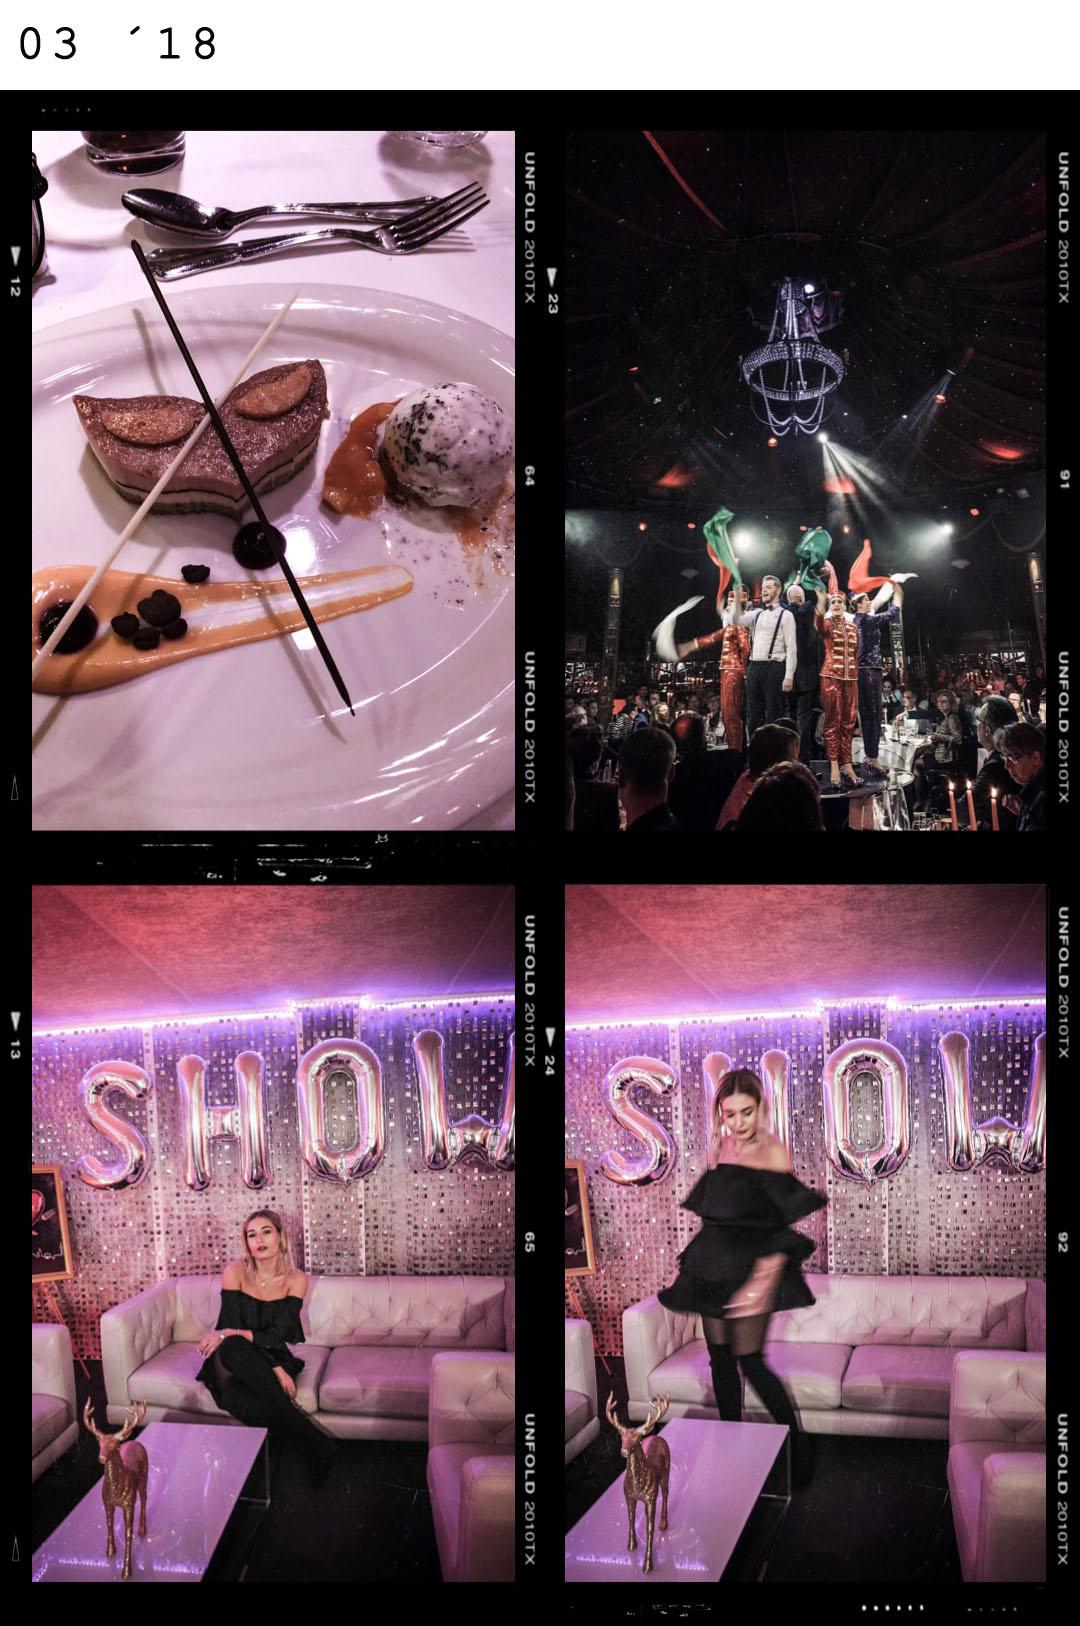 lauralamode-jahresrückblick-2018-new year-silvester-outfit-ivy revel-asos-look-silvester look-silvester outfit-new years eve look-inspo-berlin-munich-muenchen-fashionblogger-blogger